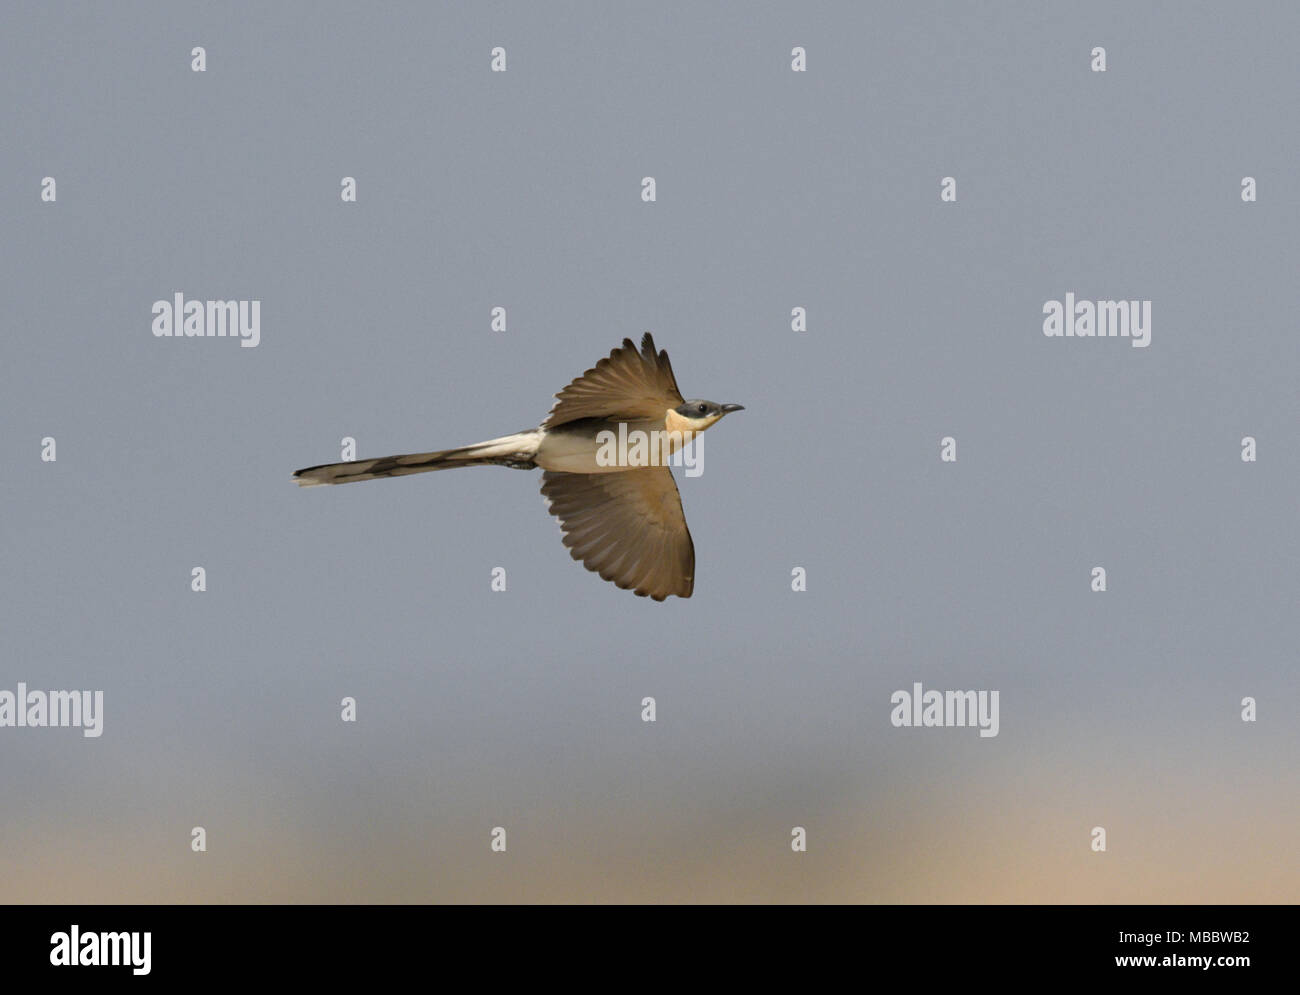 Great Spotted Cuckoo - Clamator glandarius - Stock Image